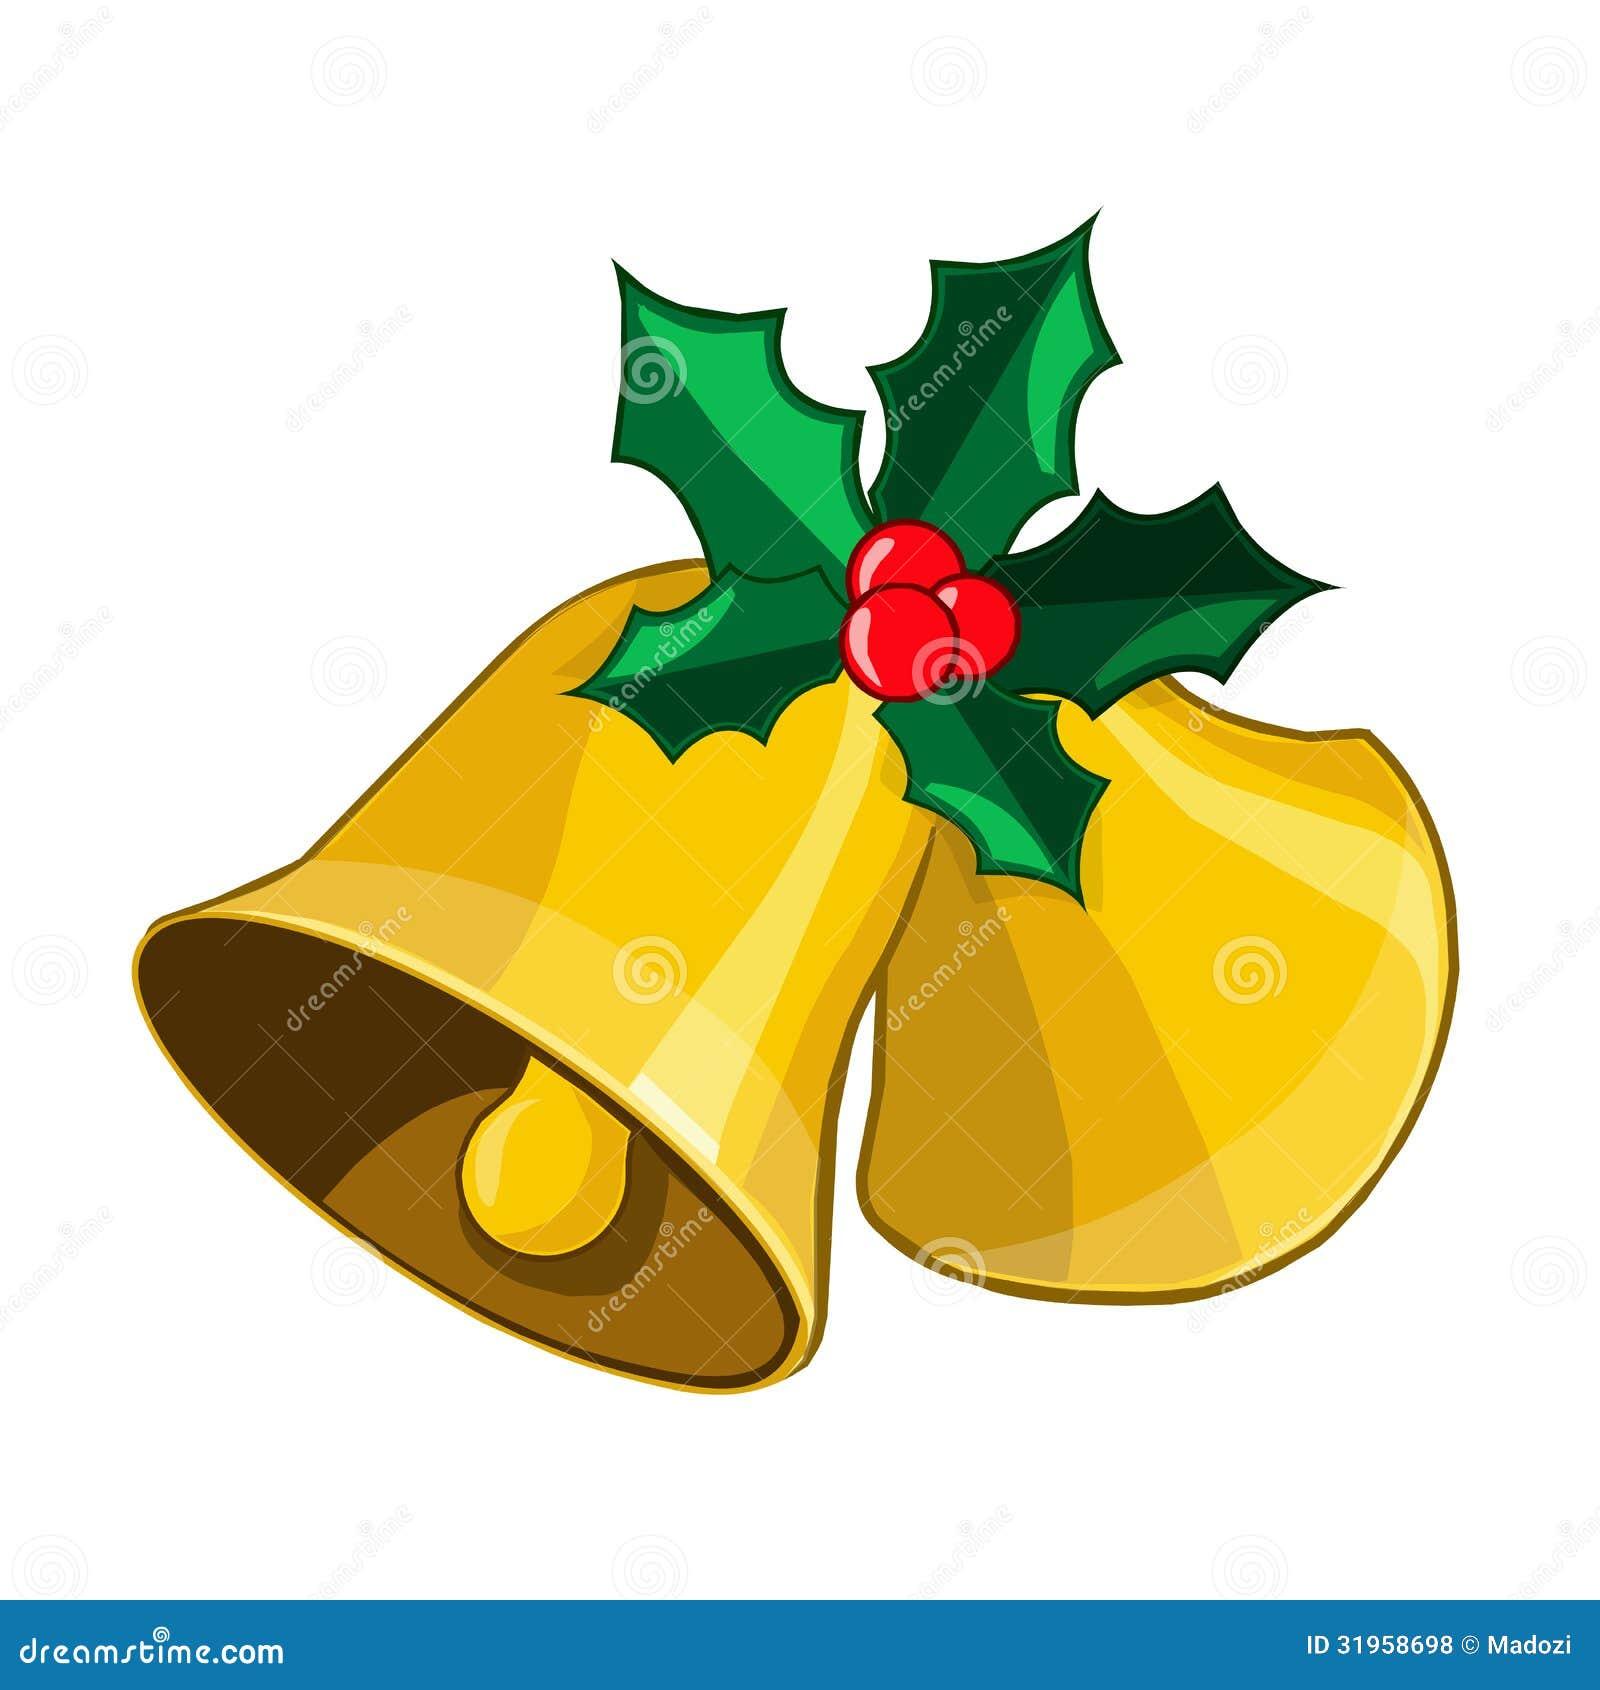 christmas jingle bells stock vector. illustration of bell - 31958698